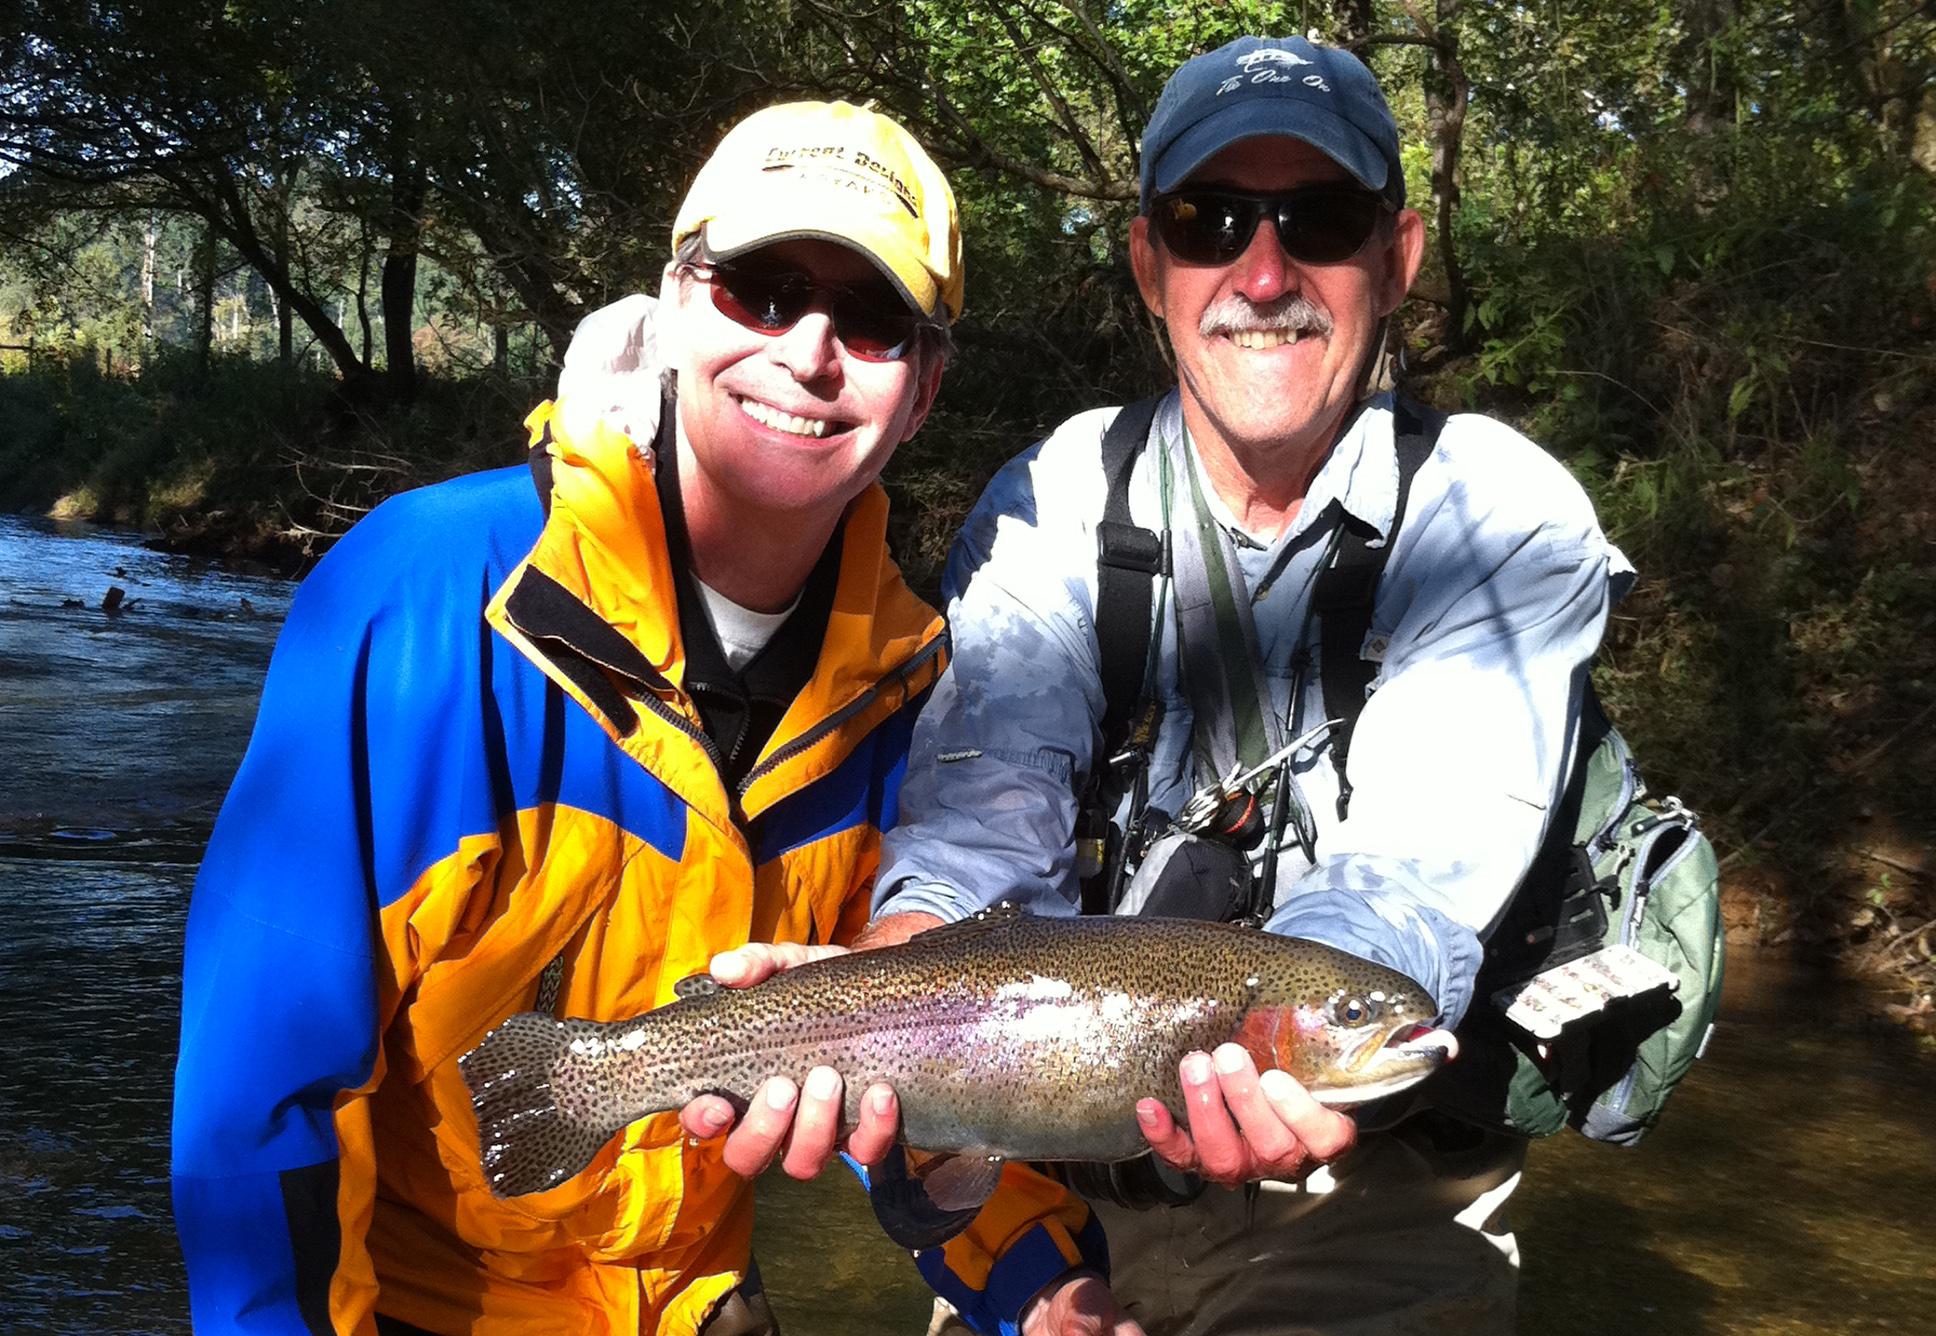 Fishing at Sautee Mountain Retreat.